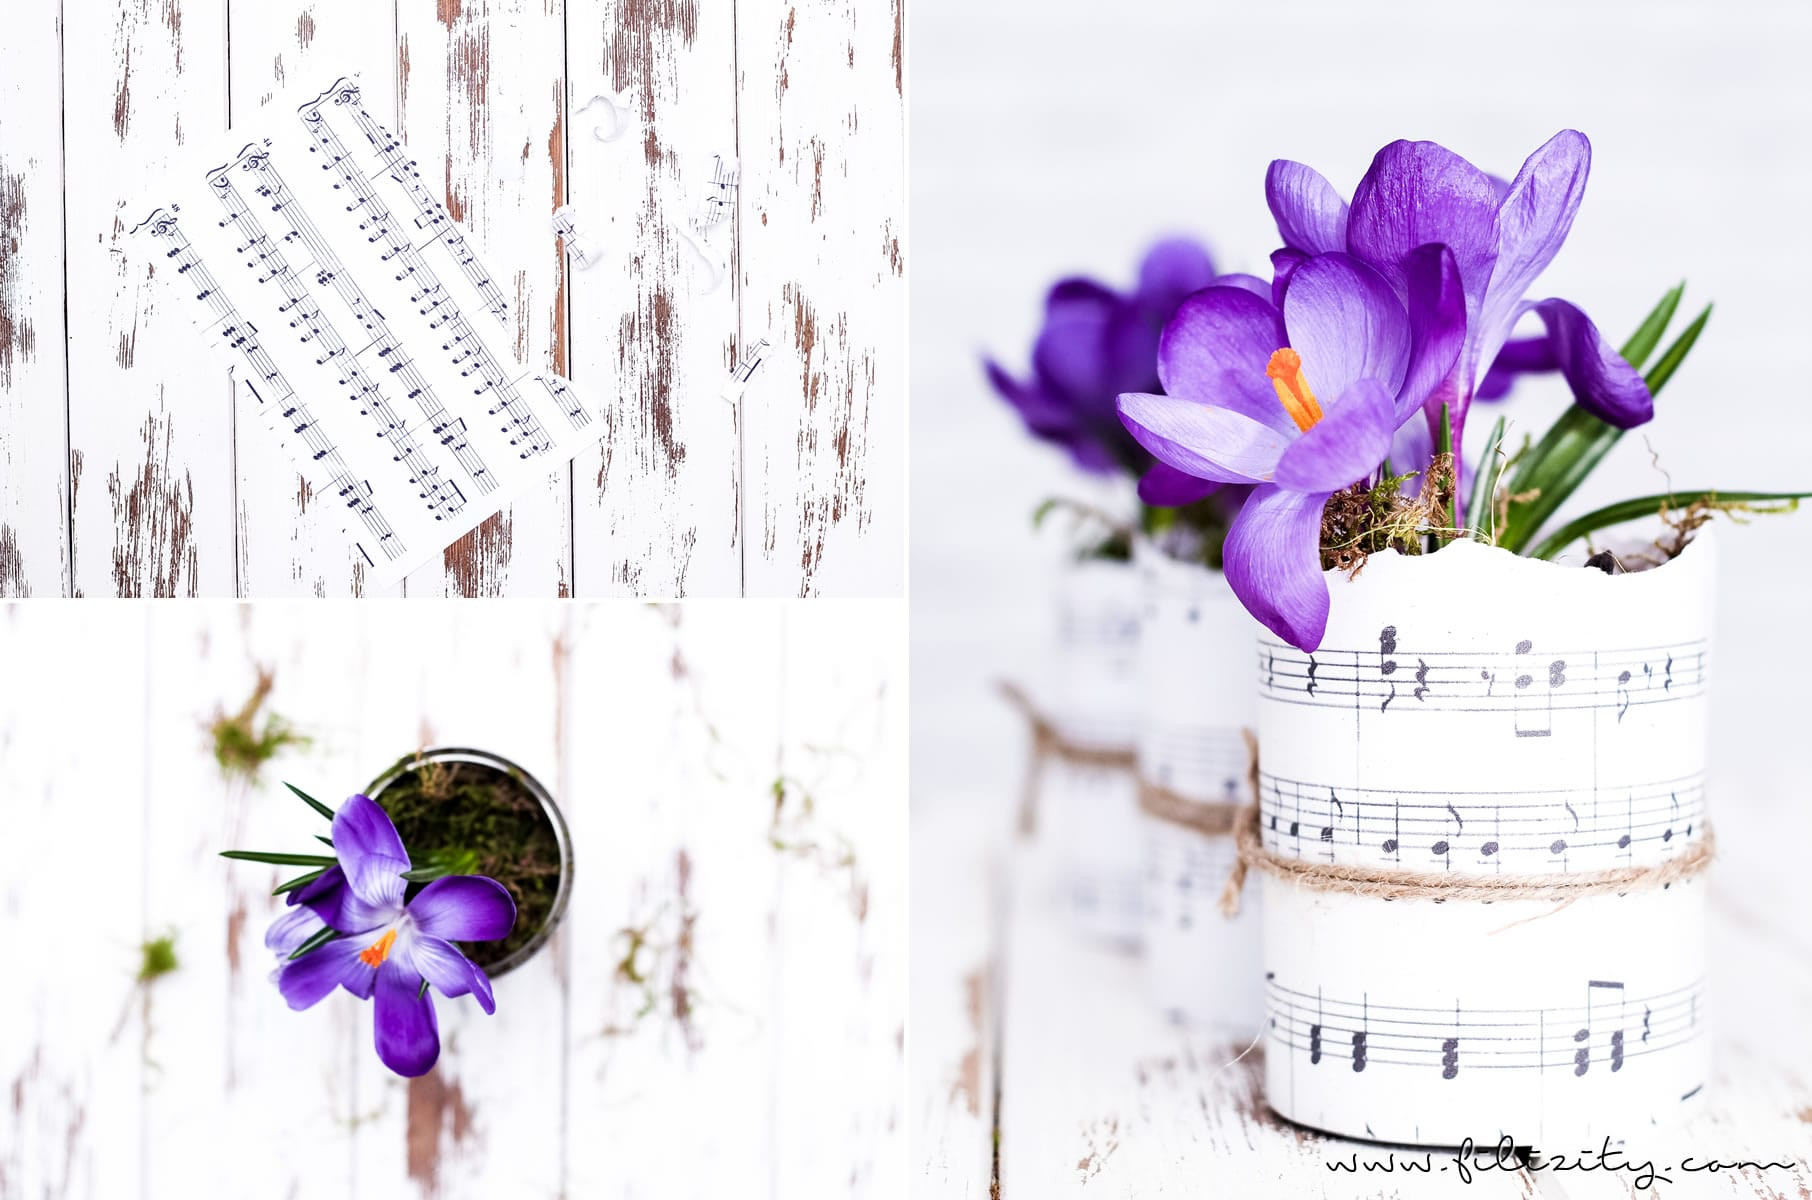 DIY Blumentöpfe aus Dosen und Papier | Upcycling & Frühlingsdeko | Filizity.com | DIY-Blog aus dem Rheinland #frühling #upcycling